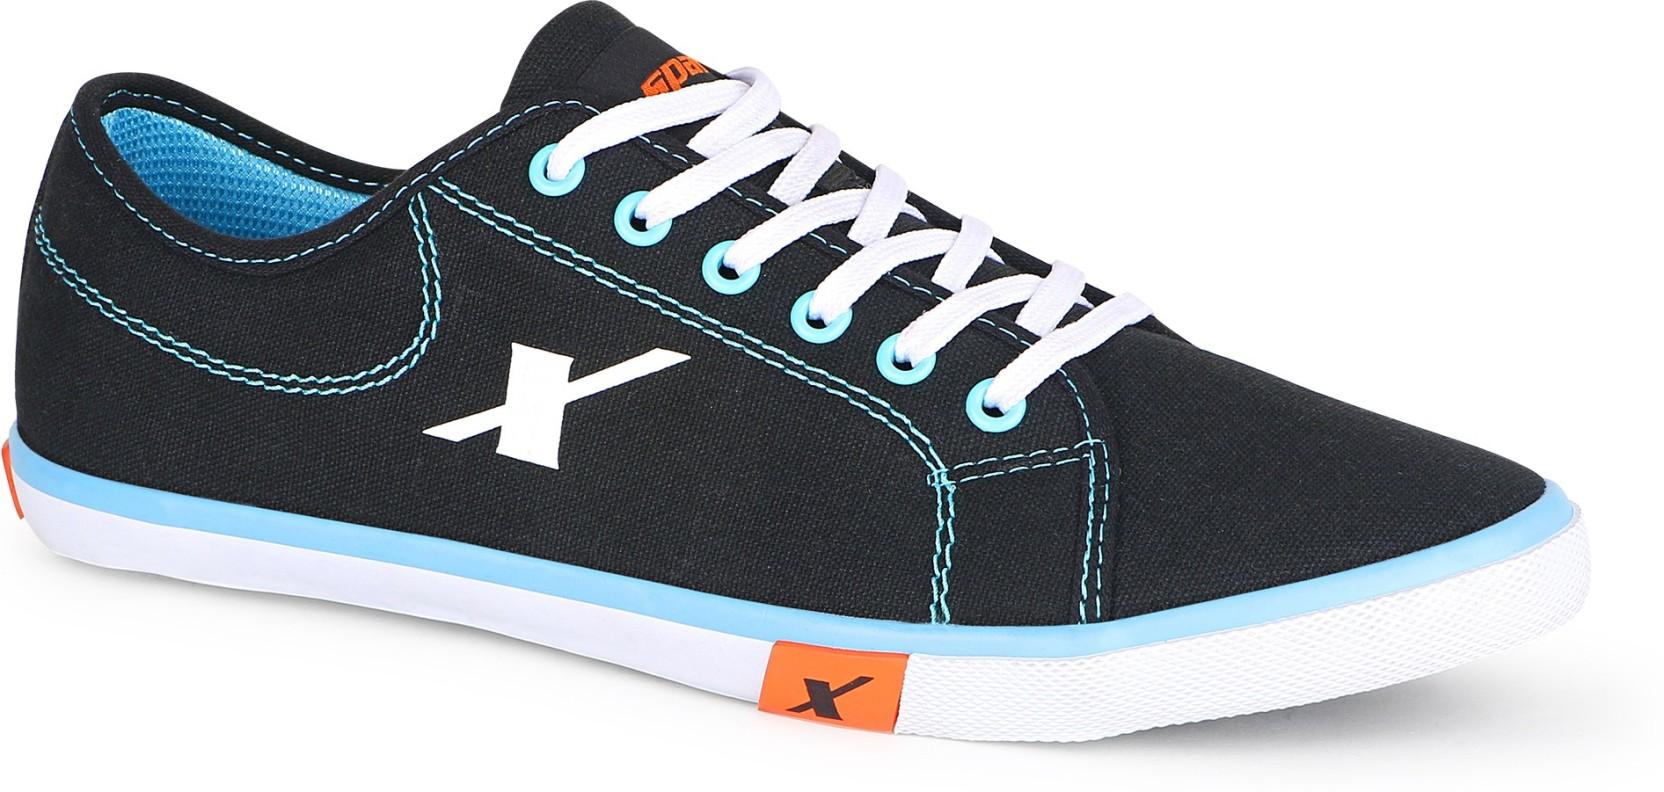 sparx 283 canvas shoes buy blackskyblue color sparx 283